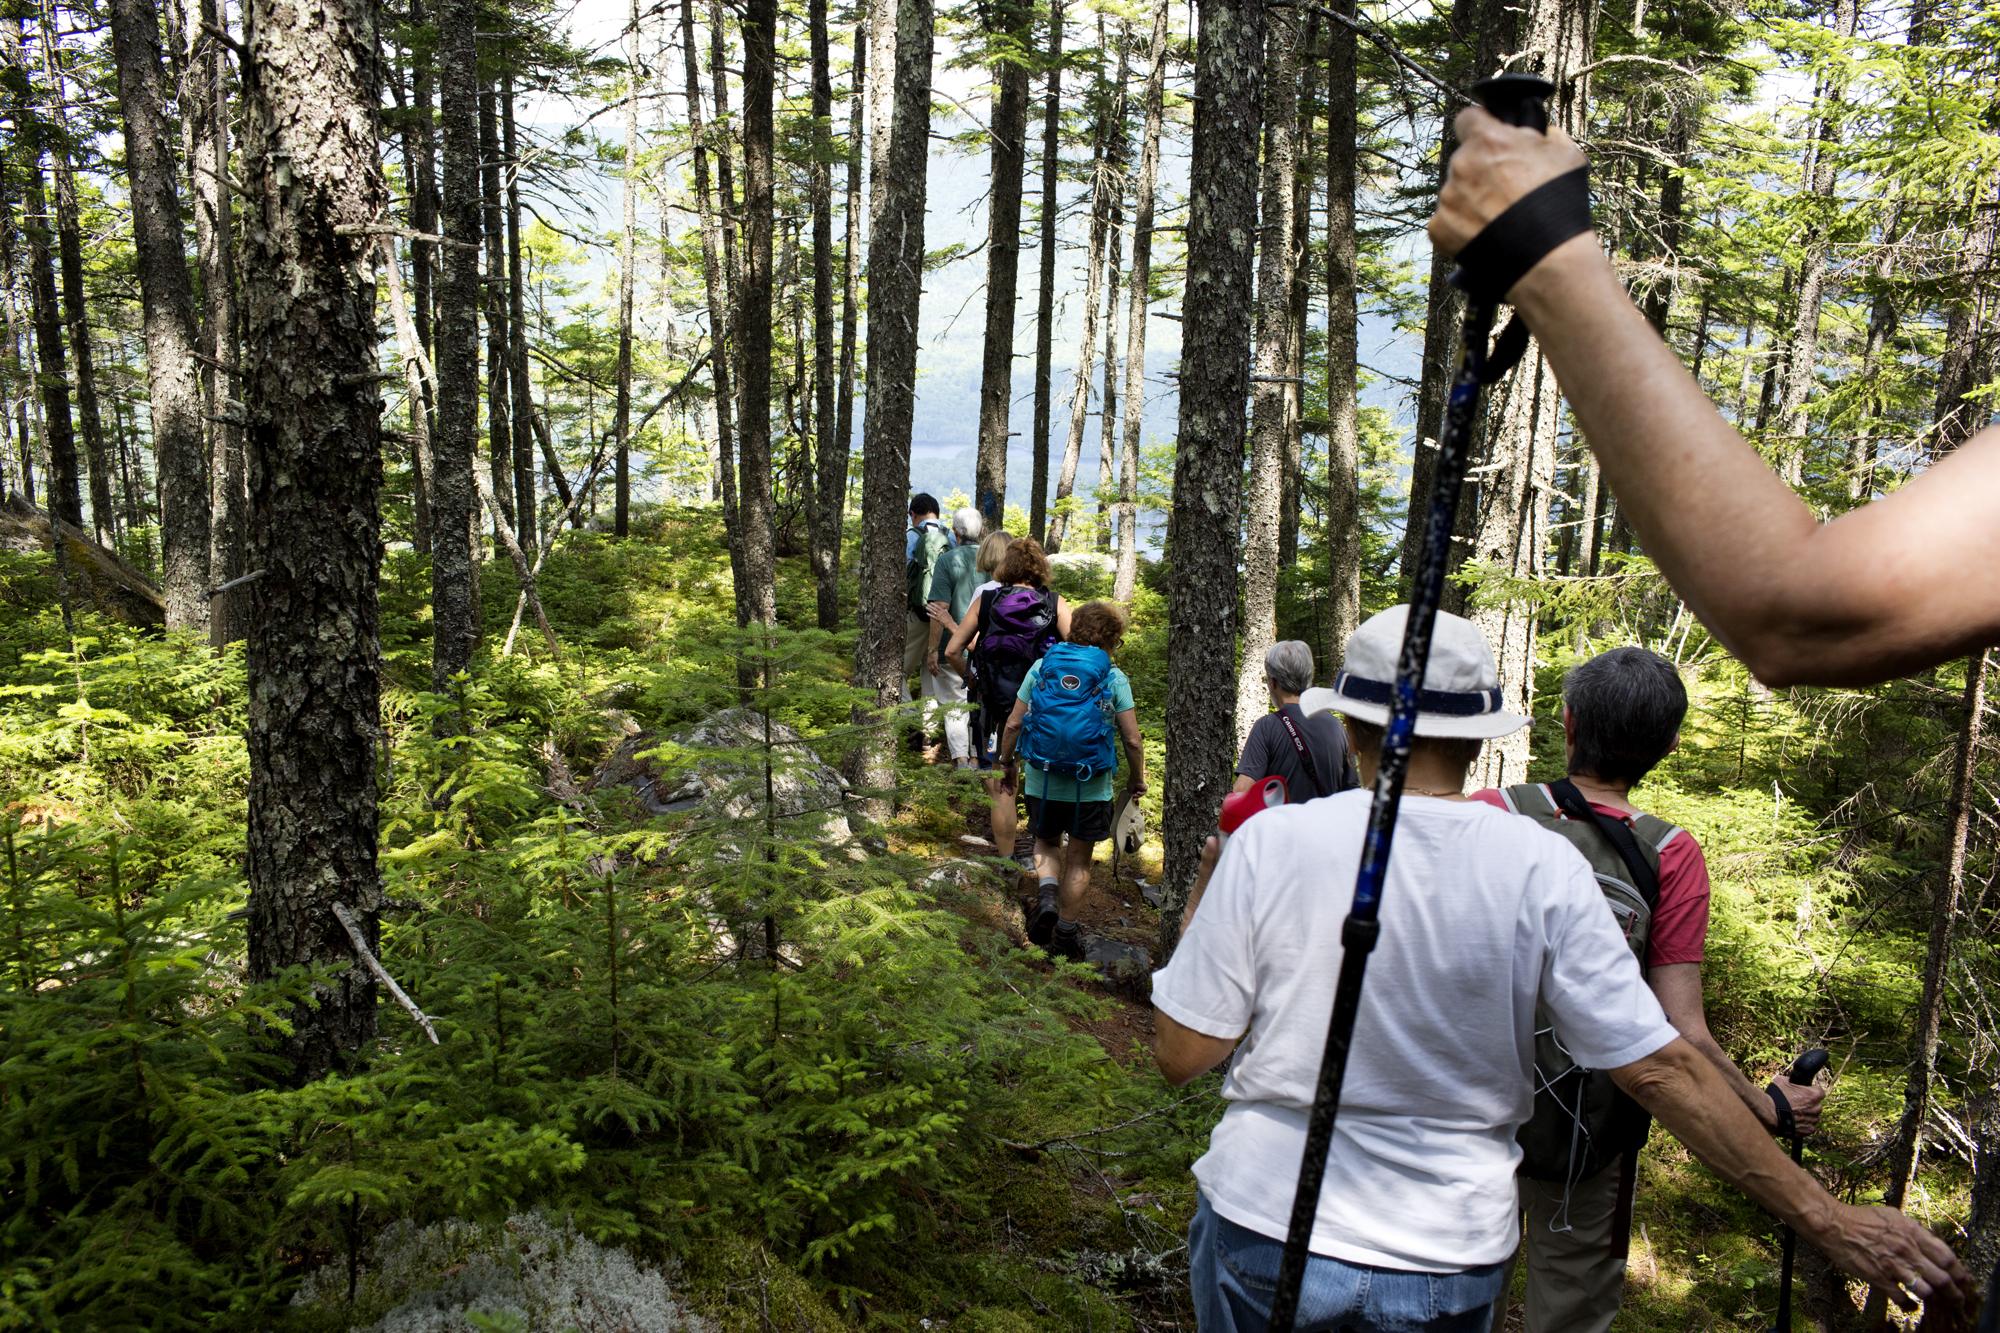 Naturalist Weekend participants hike Borestone Mountain Audubon Sanctuary trails near Elliotsville, Maine on July 21.